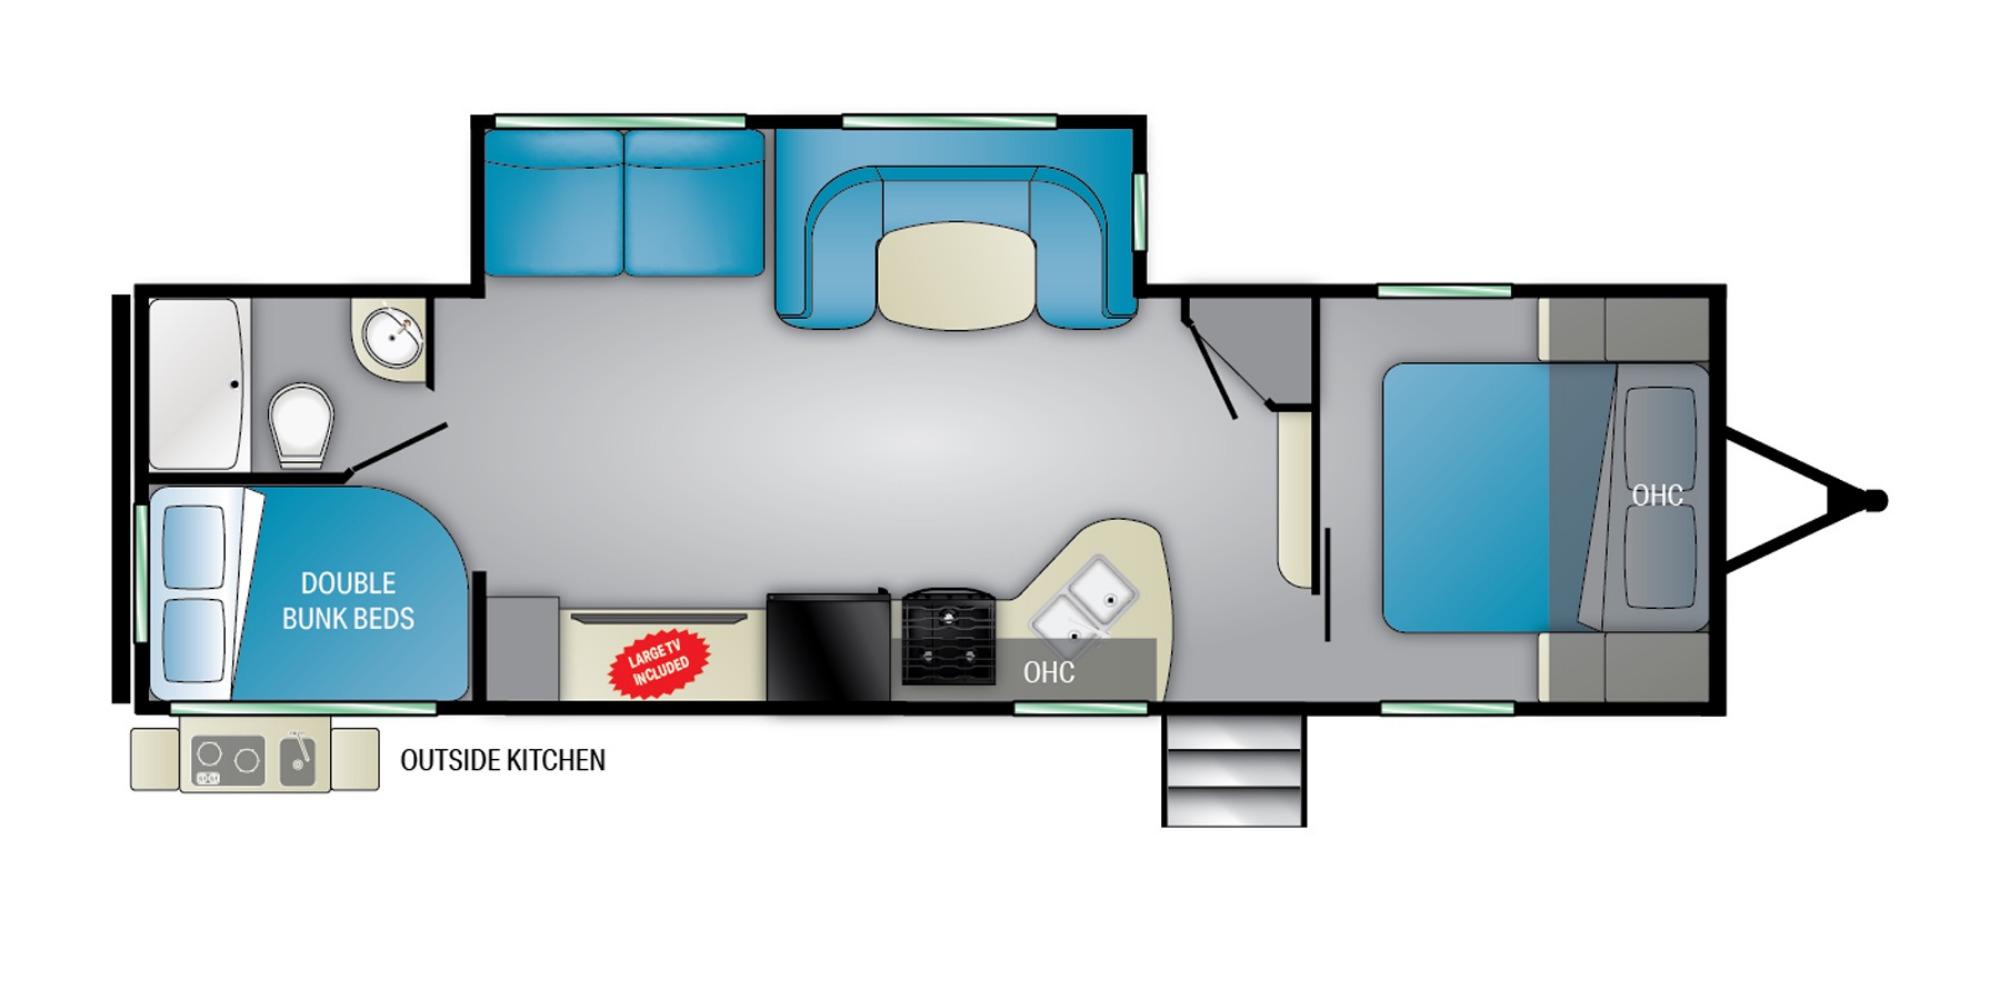 View Floor Plan for 2022 HEARTLAND PIONEER BH280